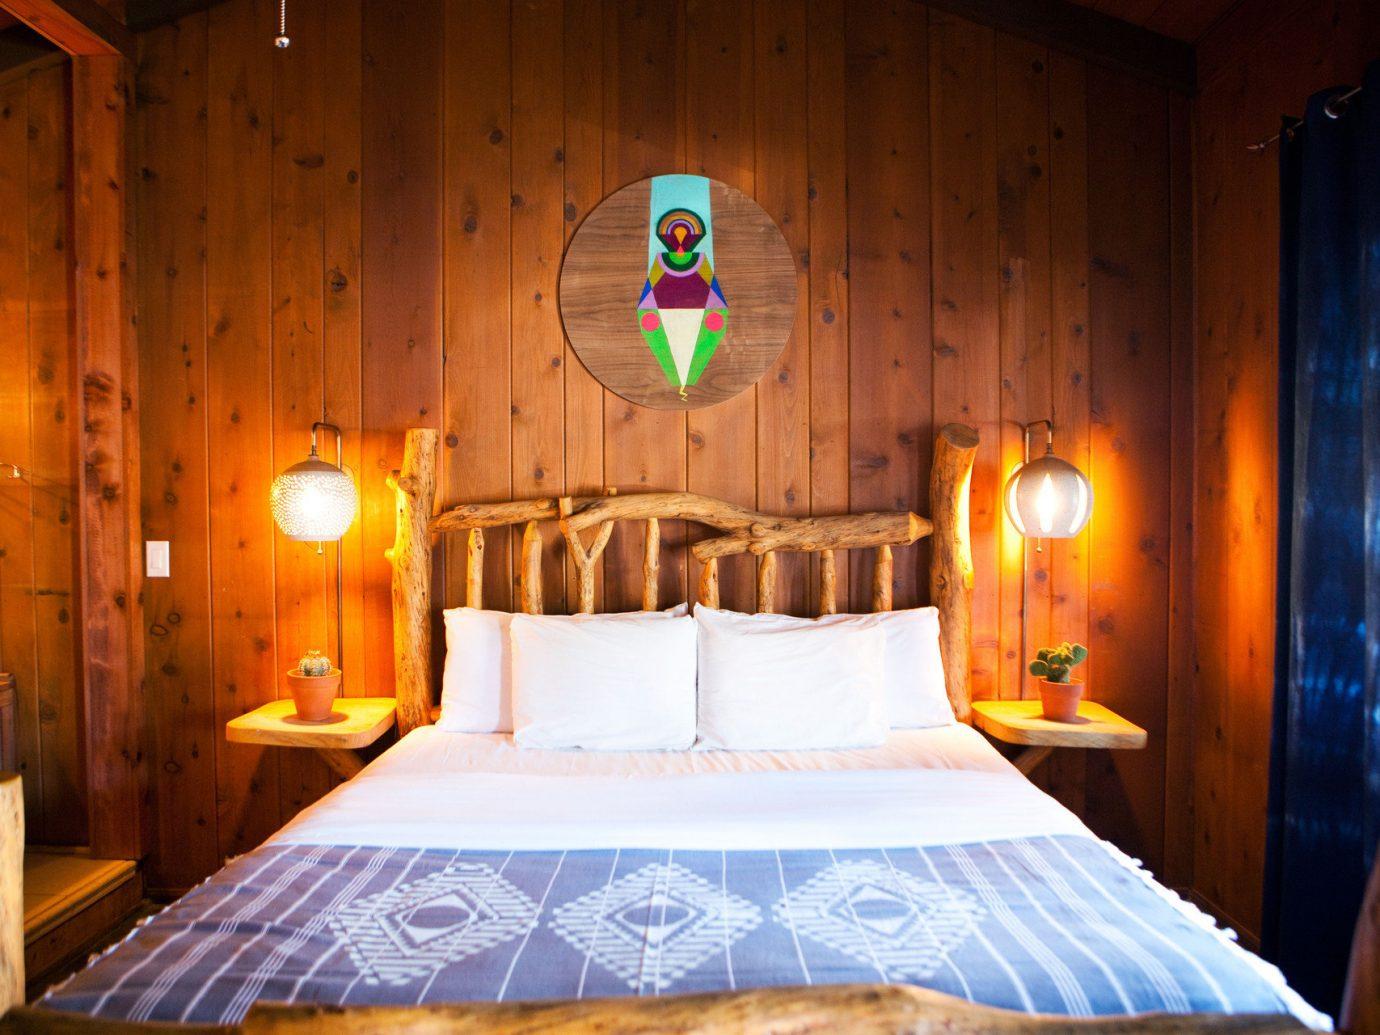 Trip Ideas indoor wall bed room ceiling Resort estate light cottage Bedroom decorated